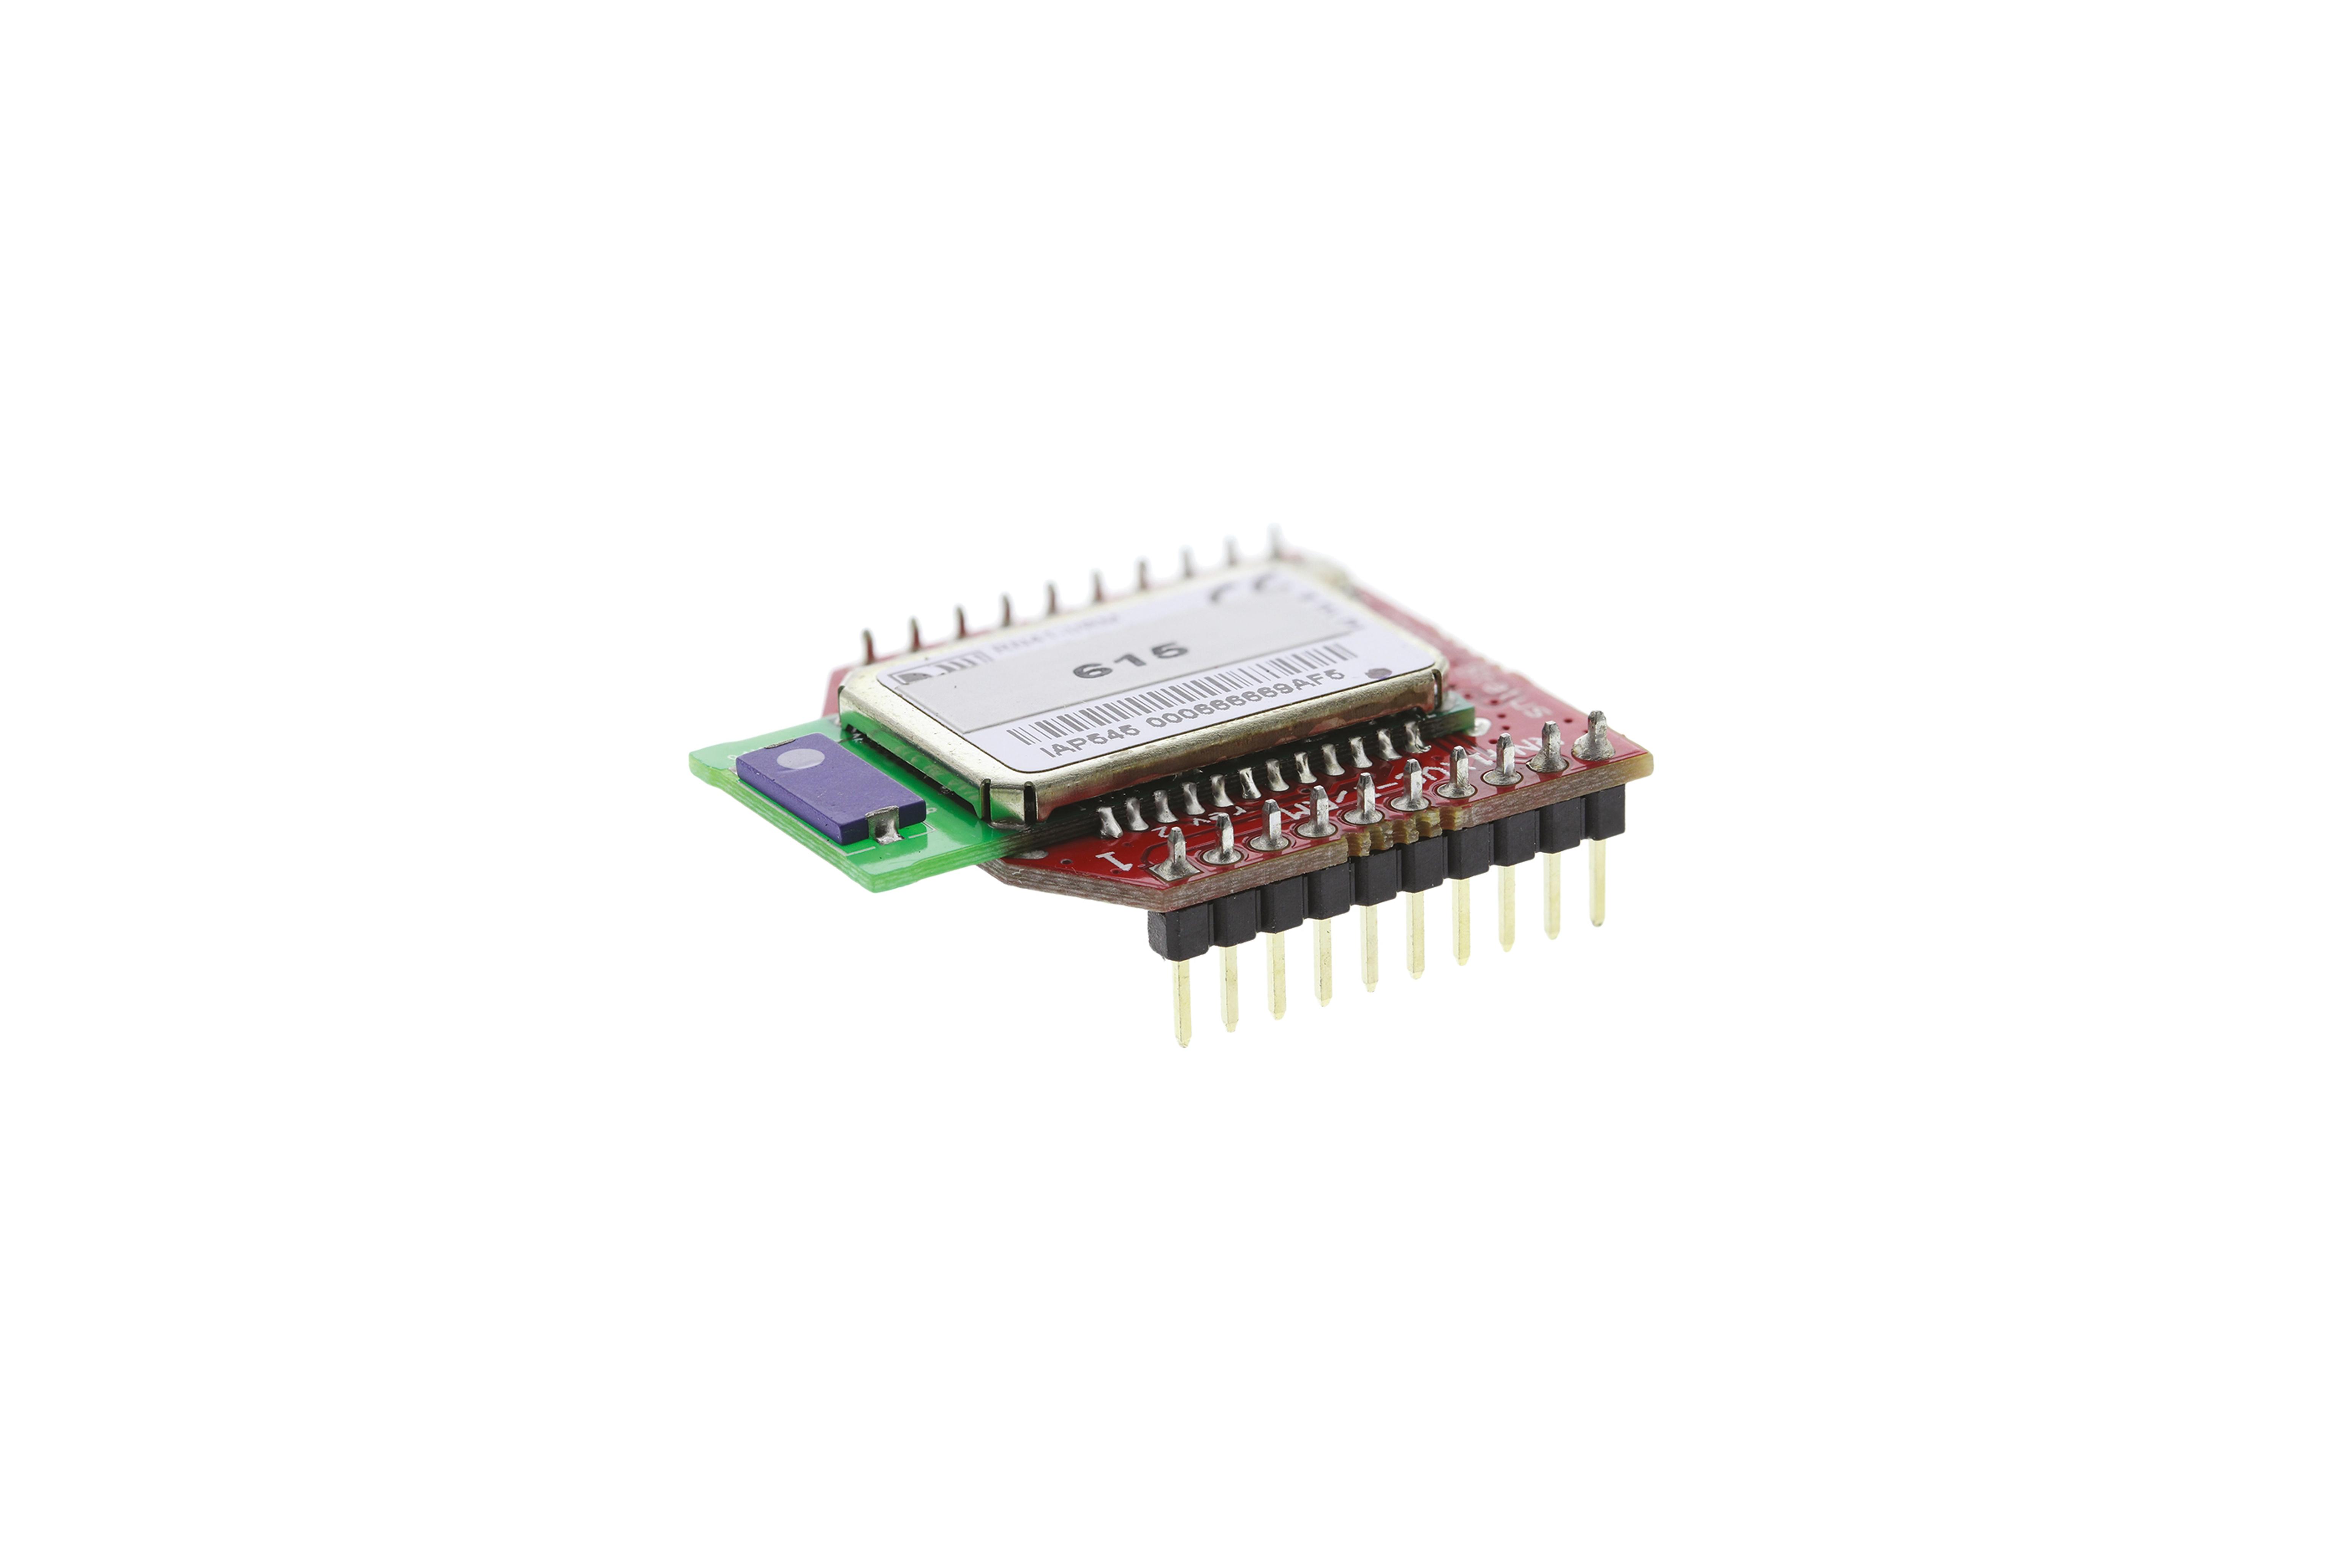 Modulo wirelessBluetooth RN41